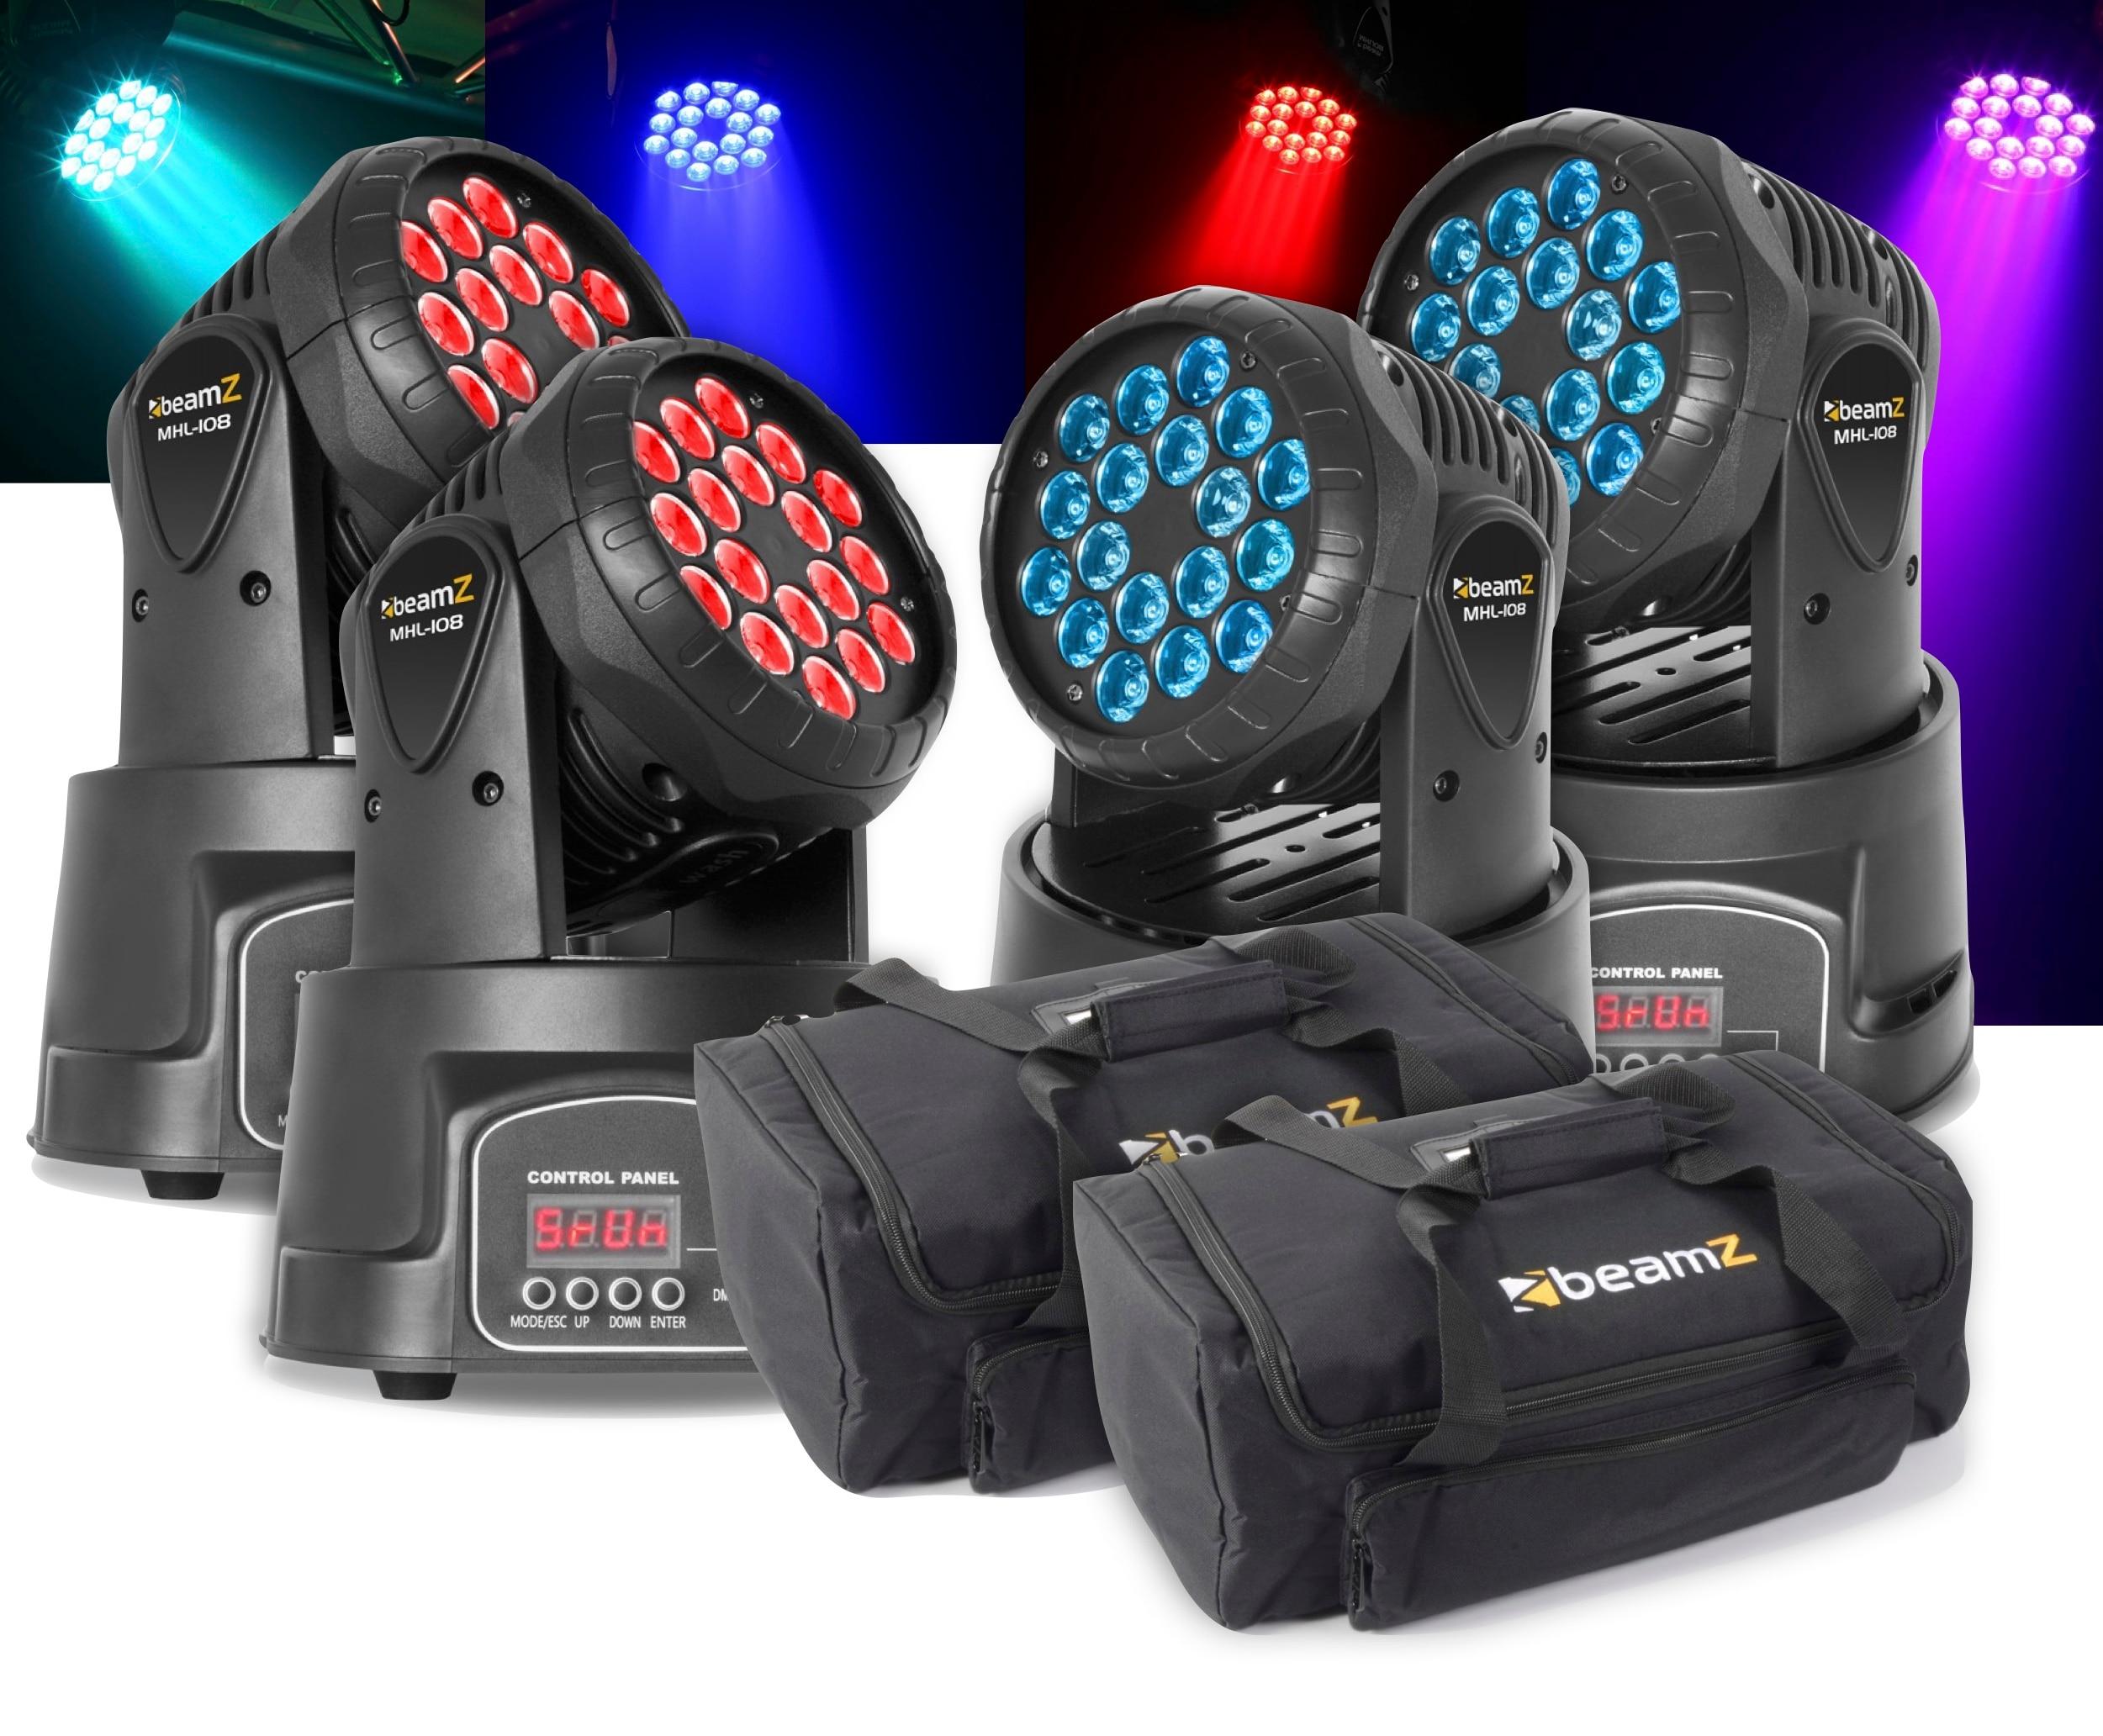 4-pack + 2st bag BeamZ MHL108MK3 Mini Moving Head 18x 3W 3-in-1 RGB LEDs